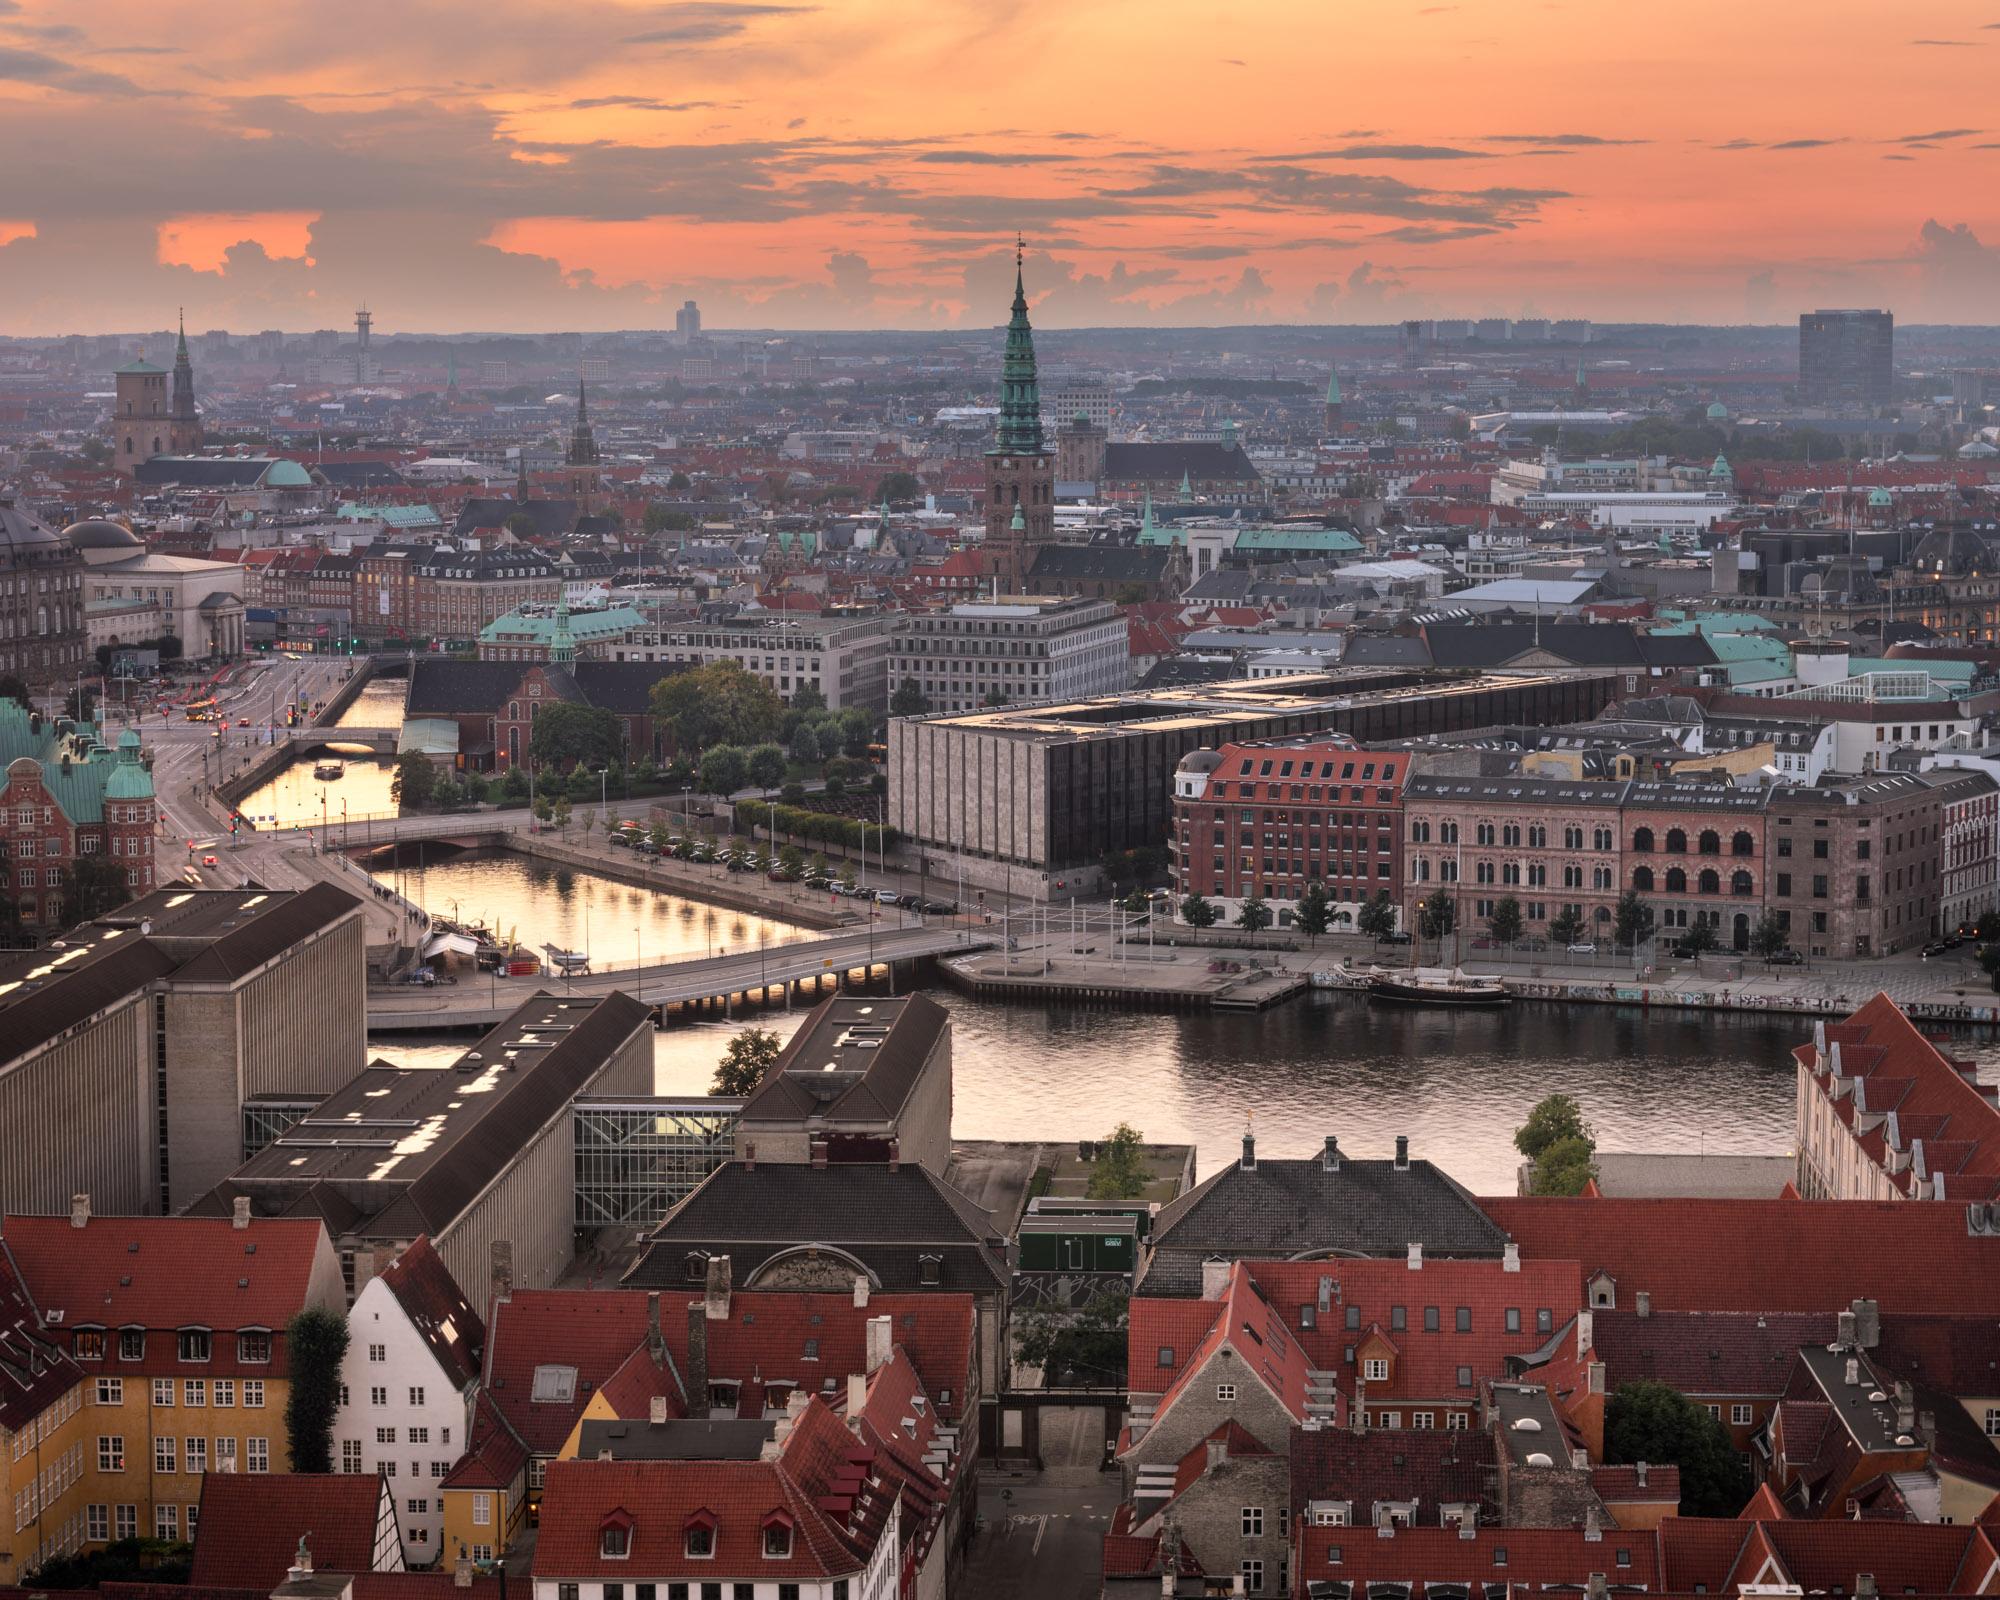 Copenhagen Skyline in the Evening, Denmark